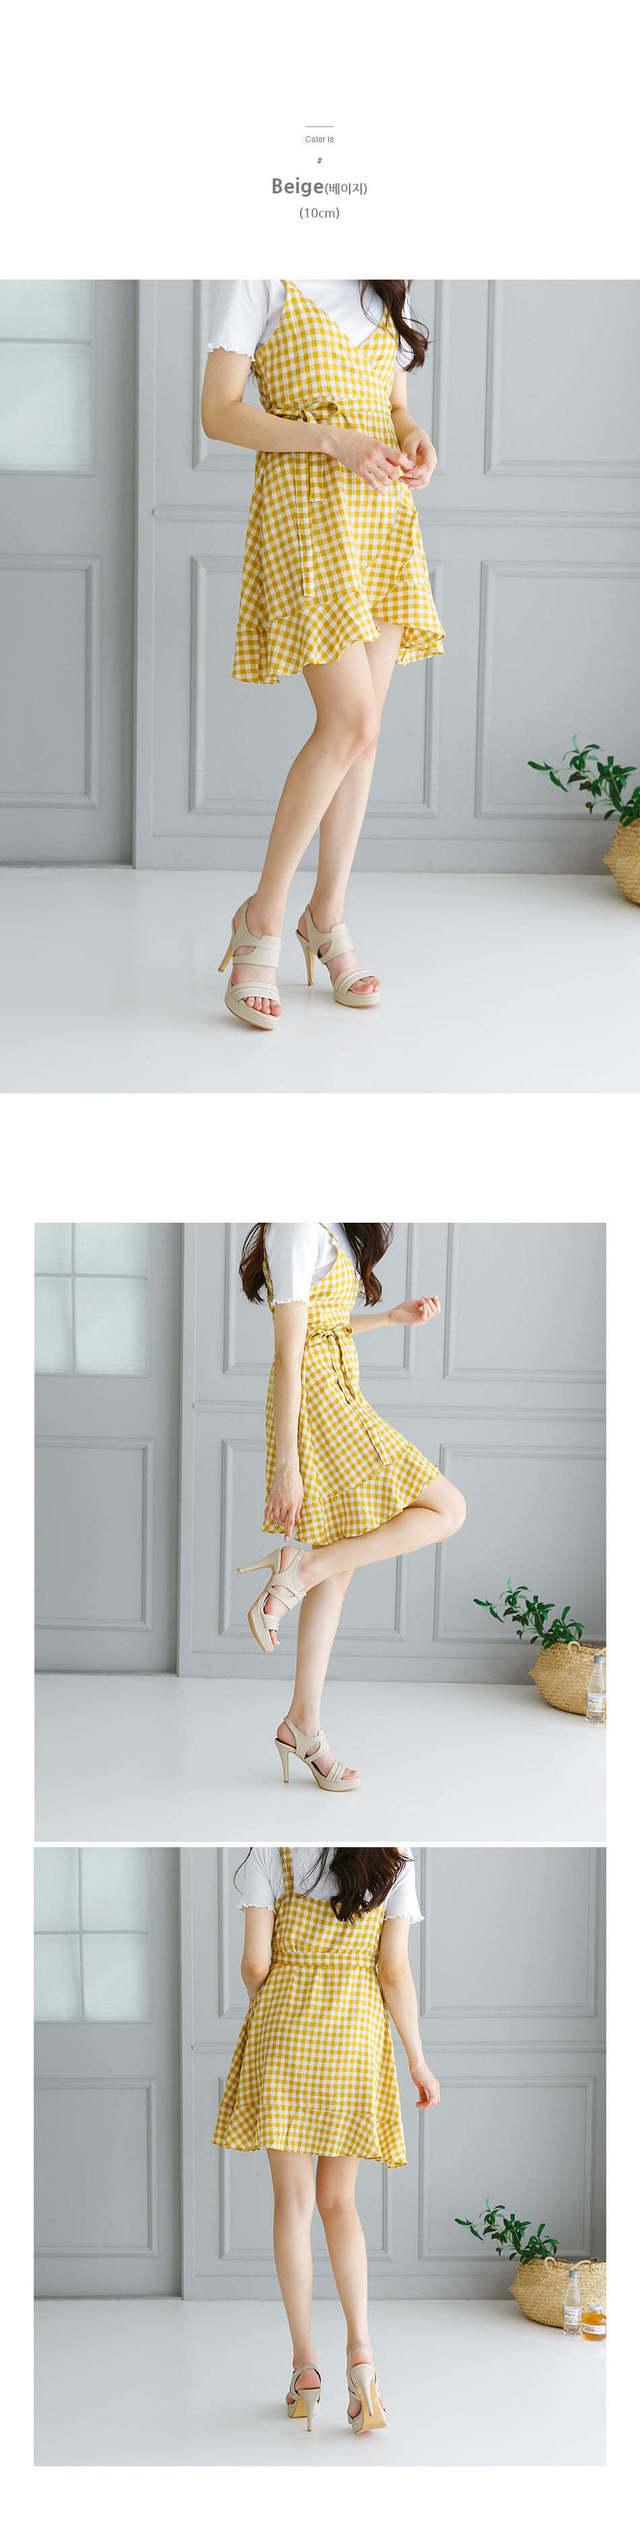 HOLLAND cutout sandals 6,10cm